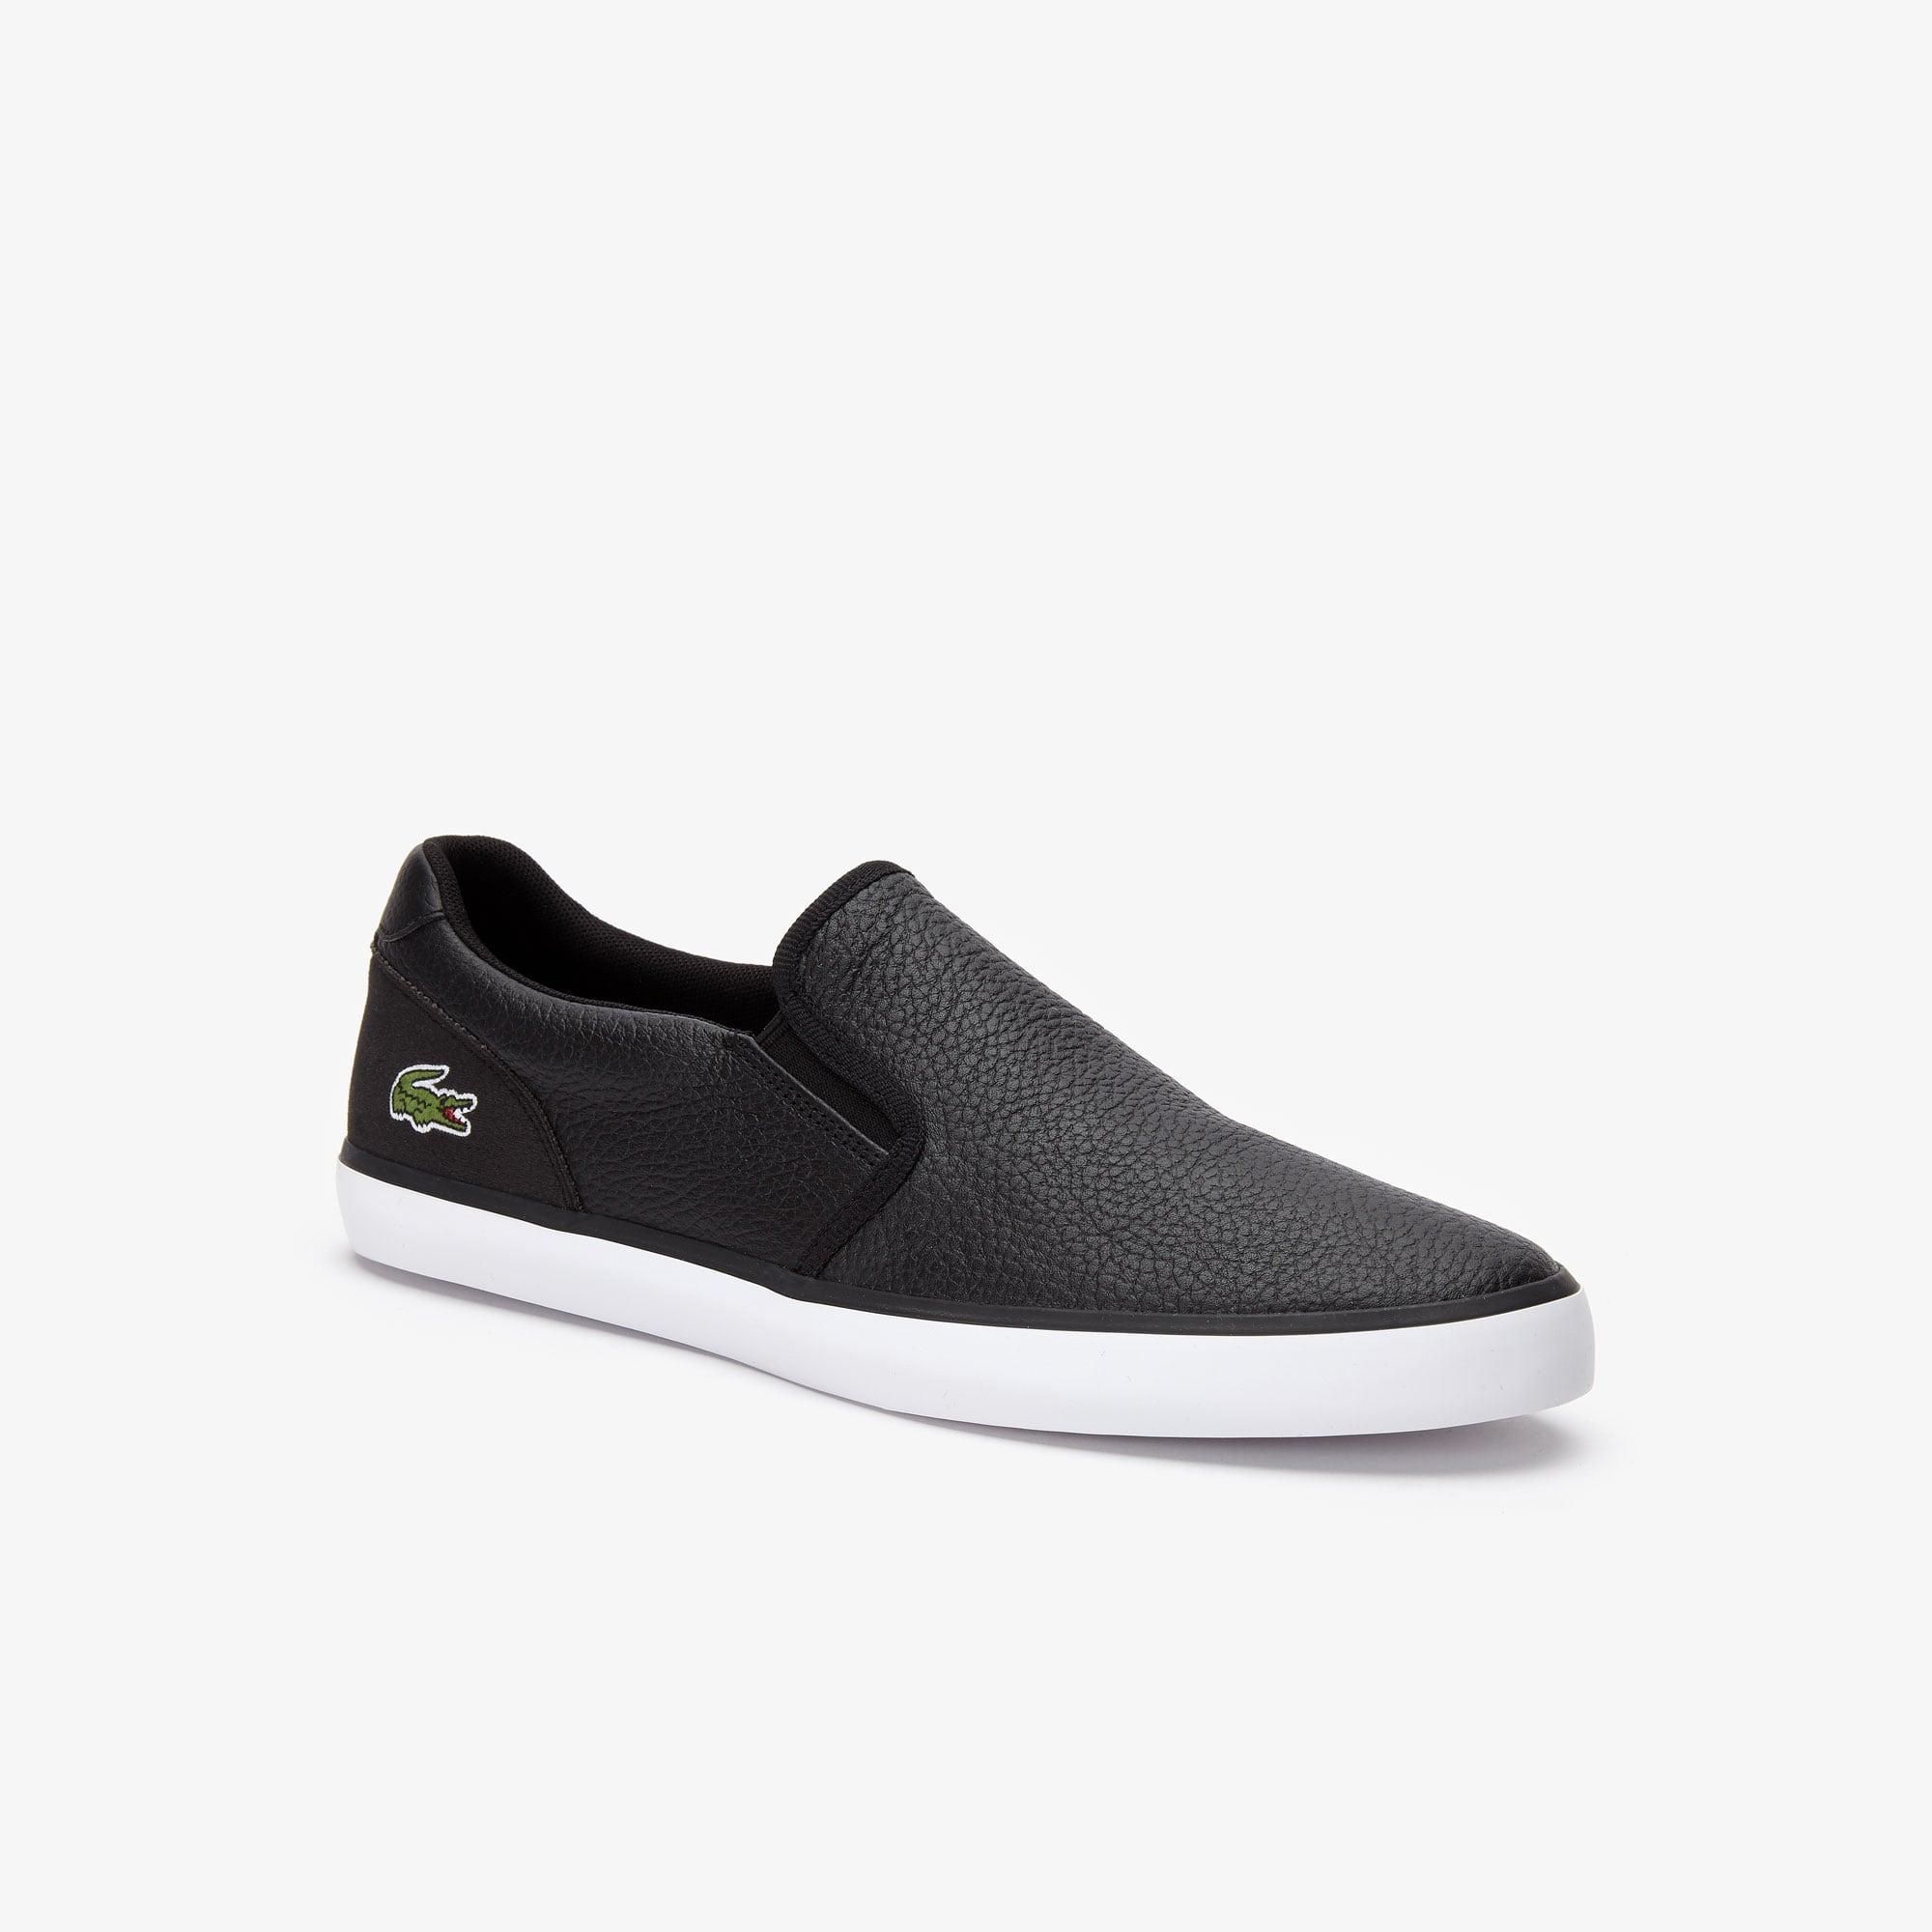 Men's Jouer Leather Slip-ons | LACOSTE